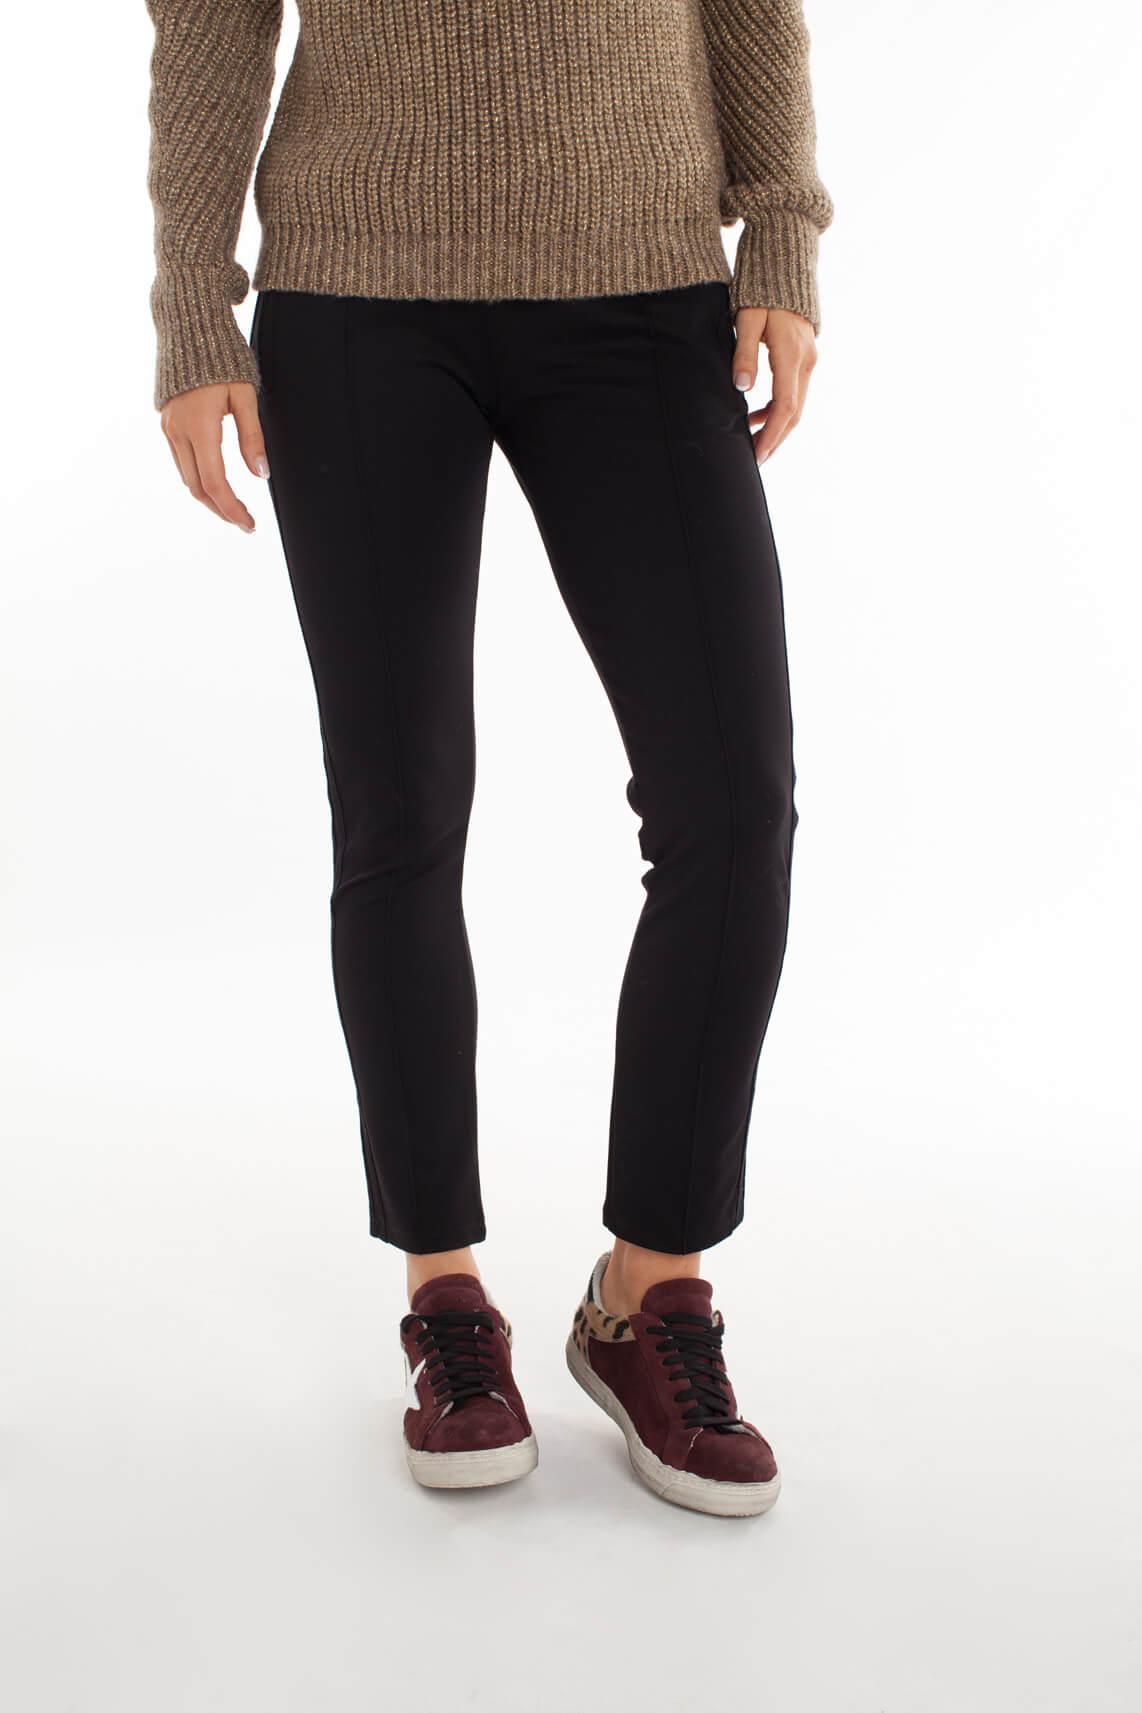 10 Days Dames Jogpantalon met ritszakken zwart